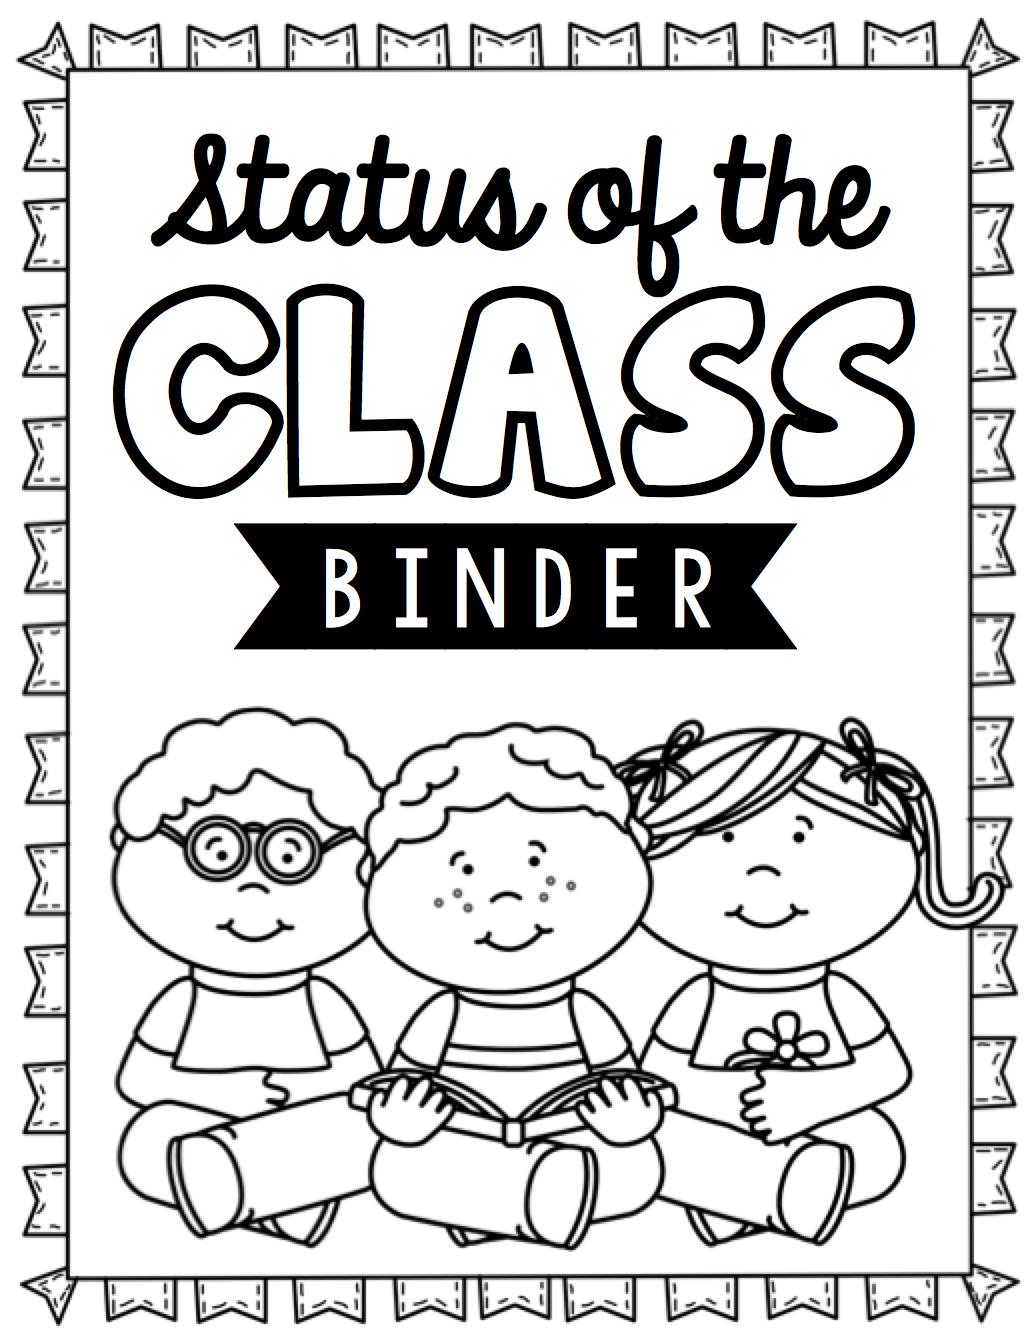 Upper Elementary Snapshots: My Favorite Classroom Routine